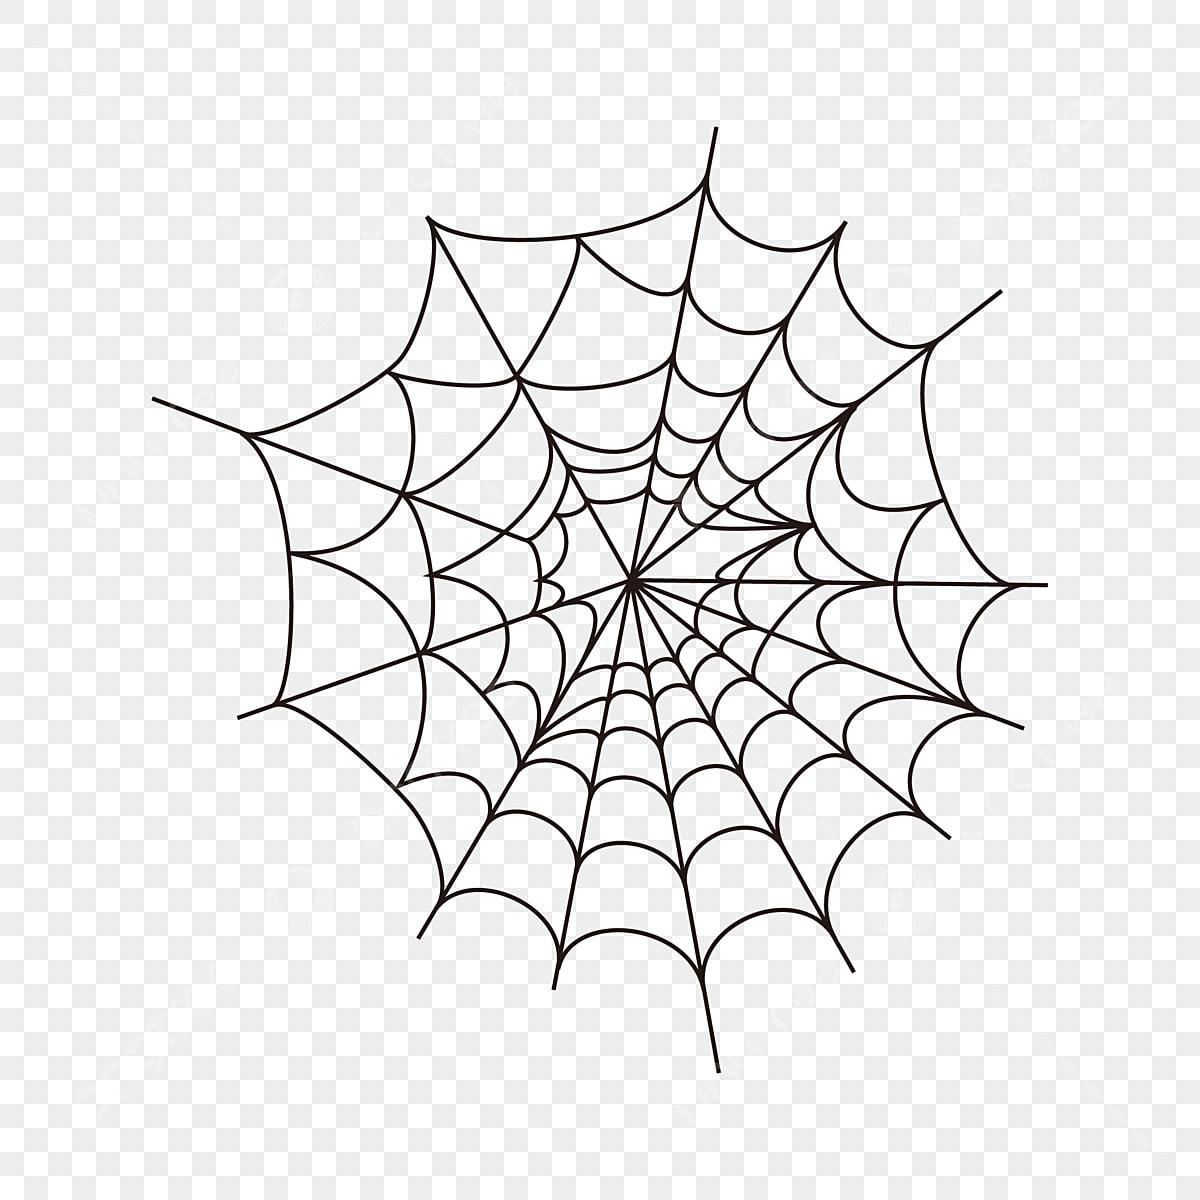 Spider web cartoon. Creative icon clipart